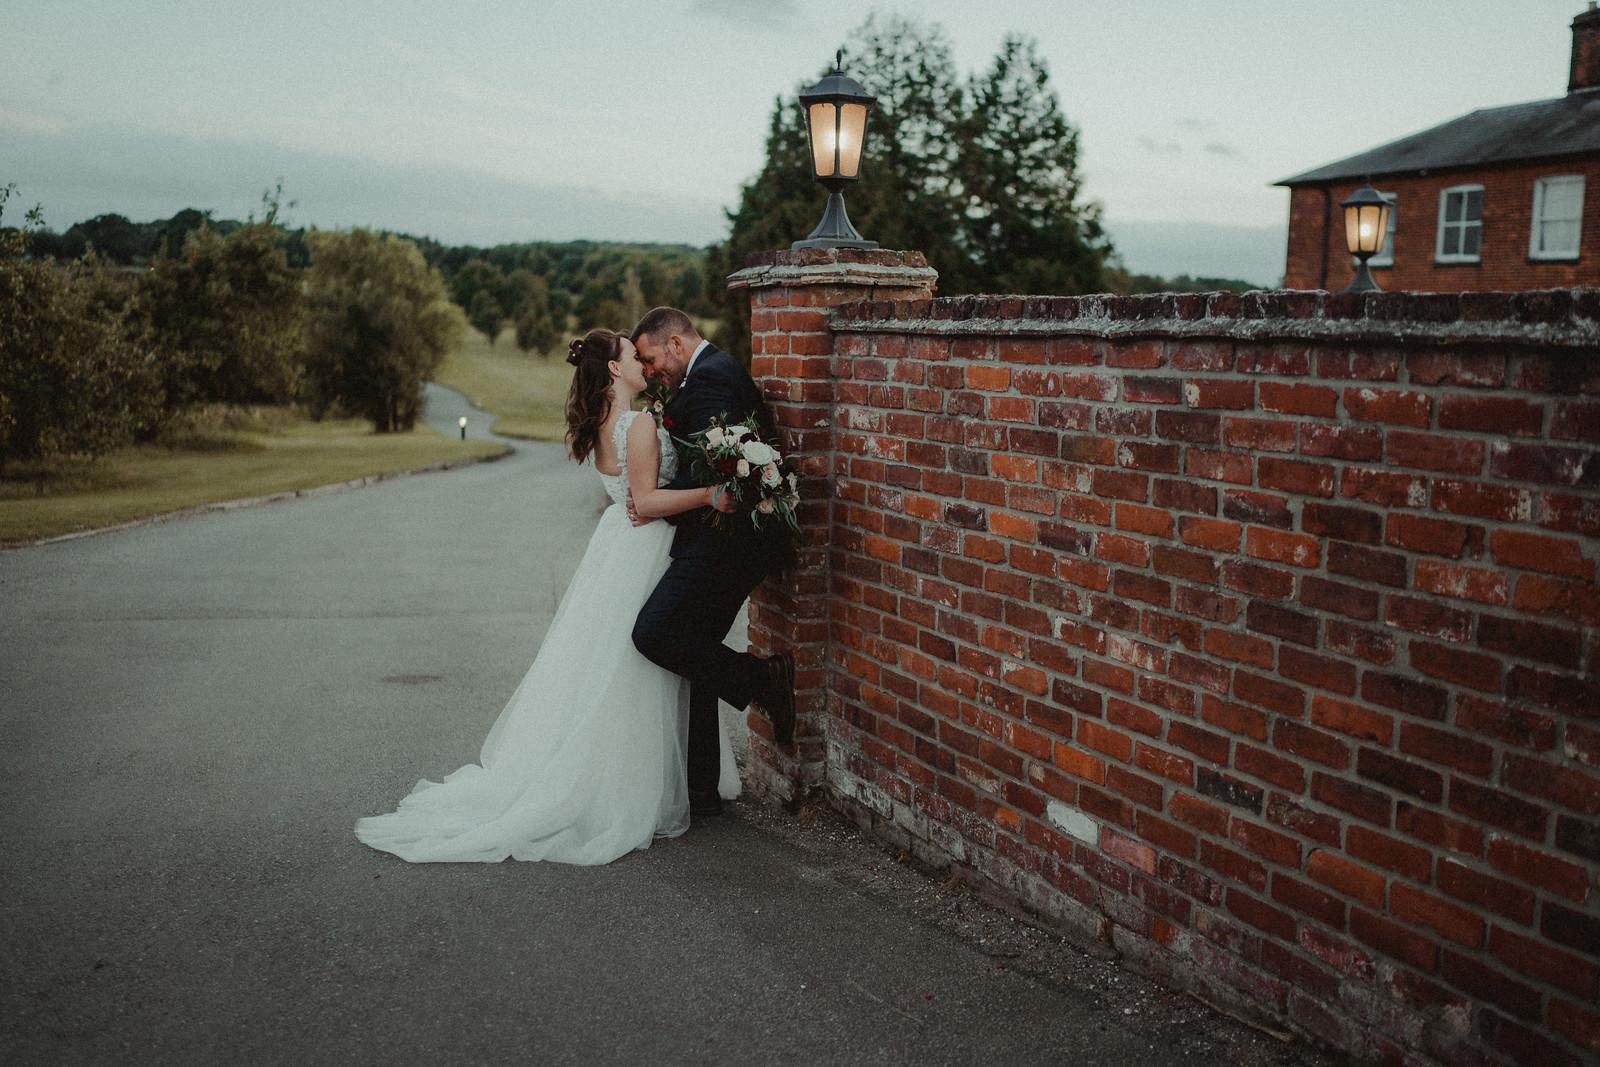 Bride and Groom Wedding photos - wedding photography